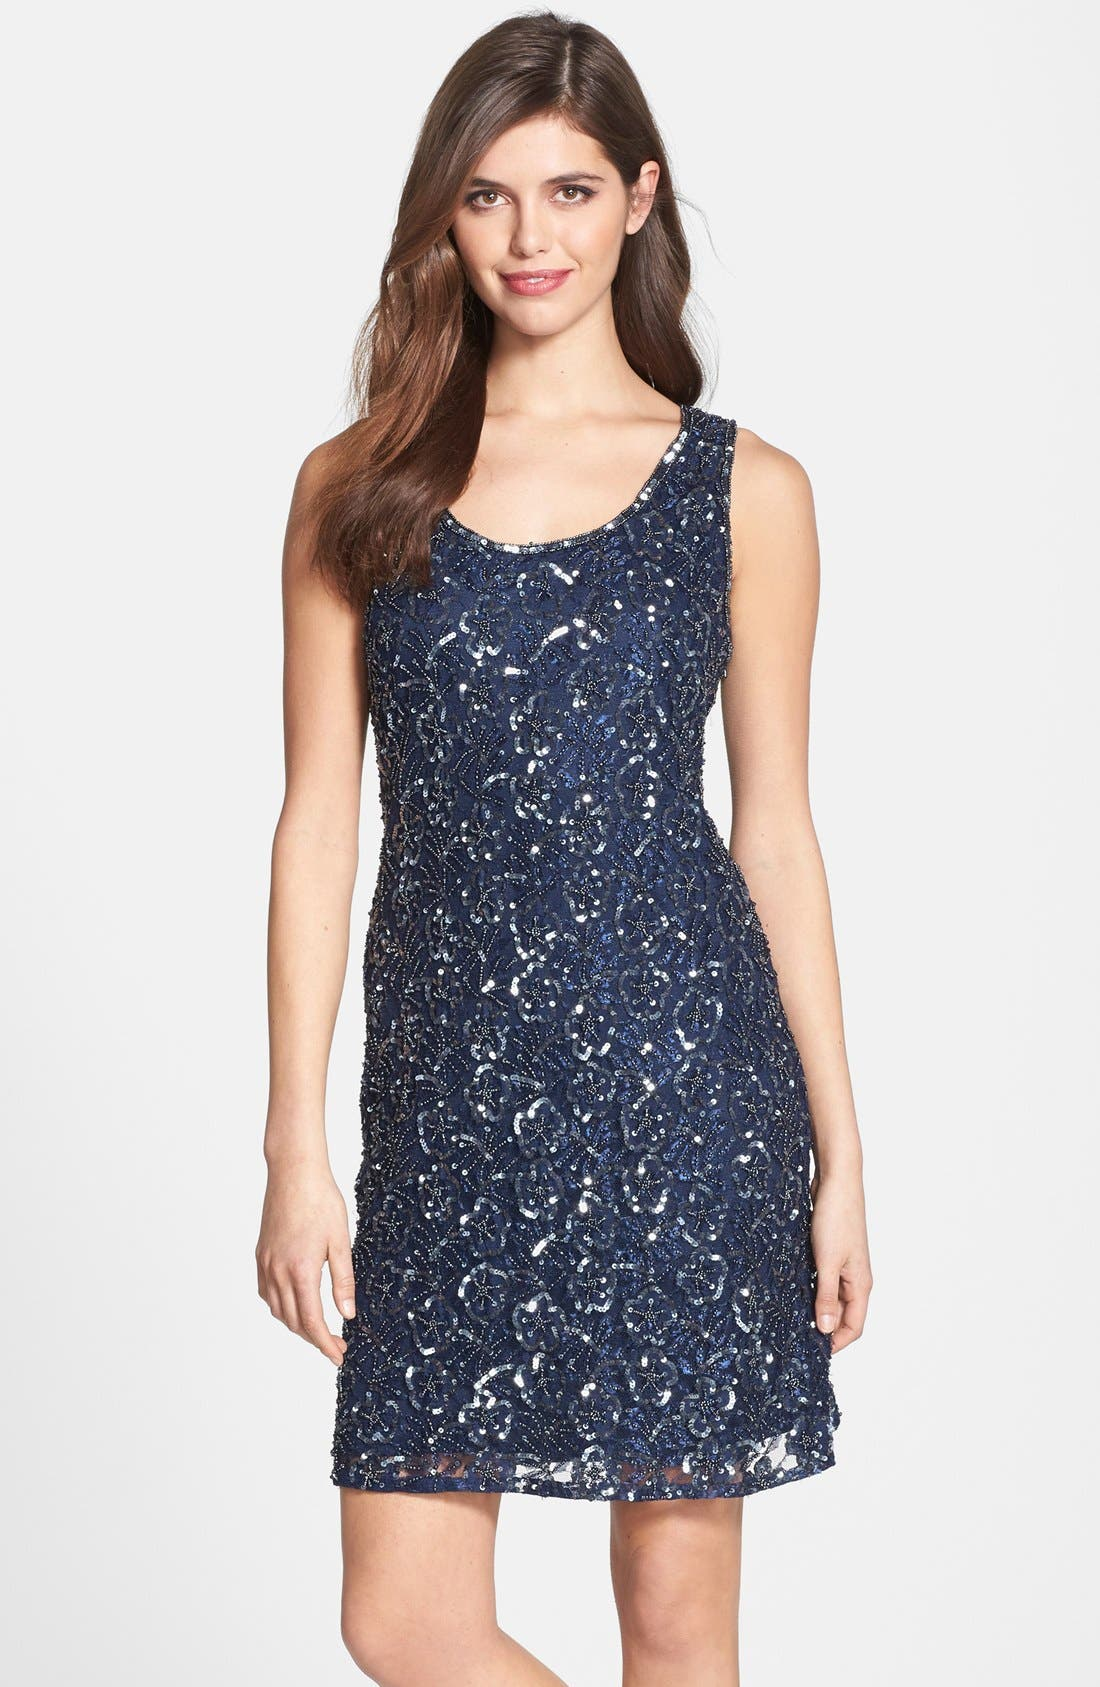 Alternate Image 1 Selected - Pisarro Nights Embellished Mesh A-Line Dress